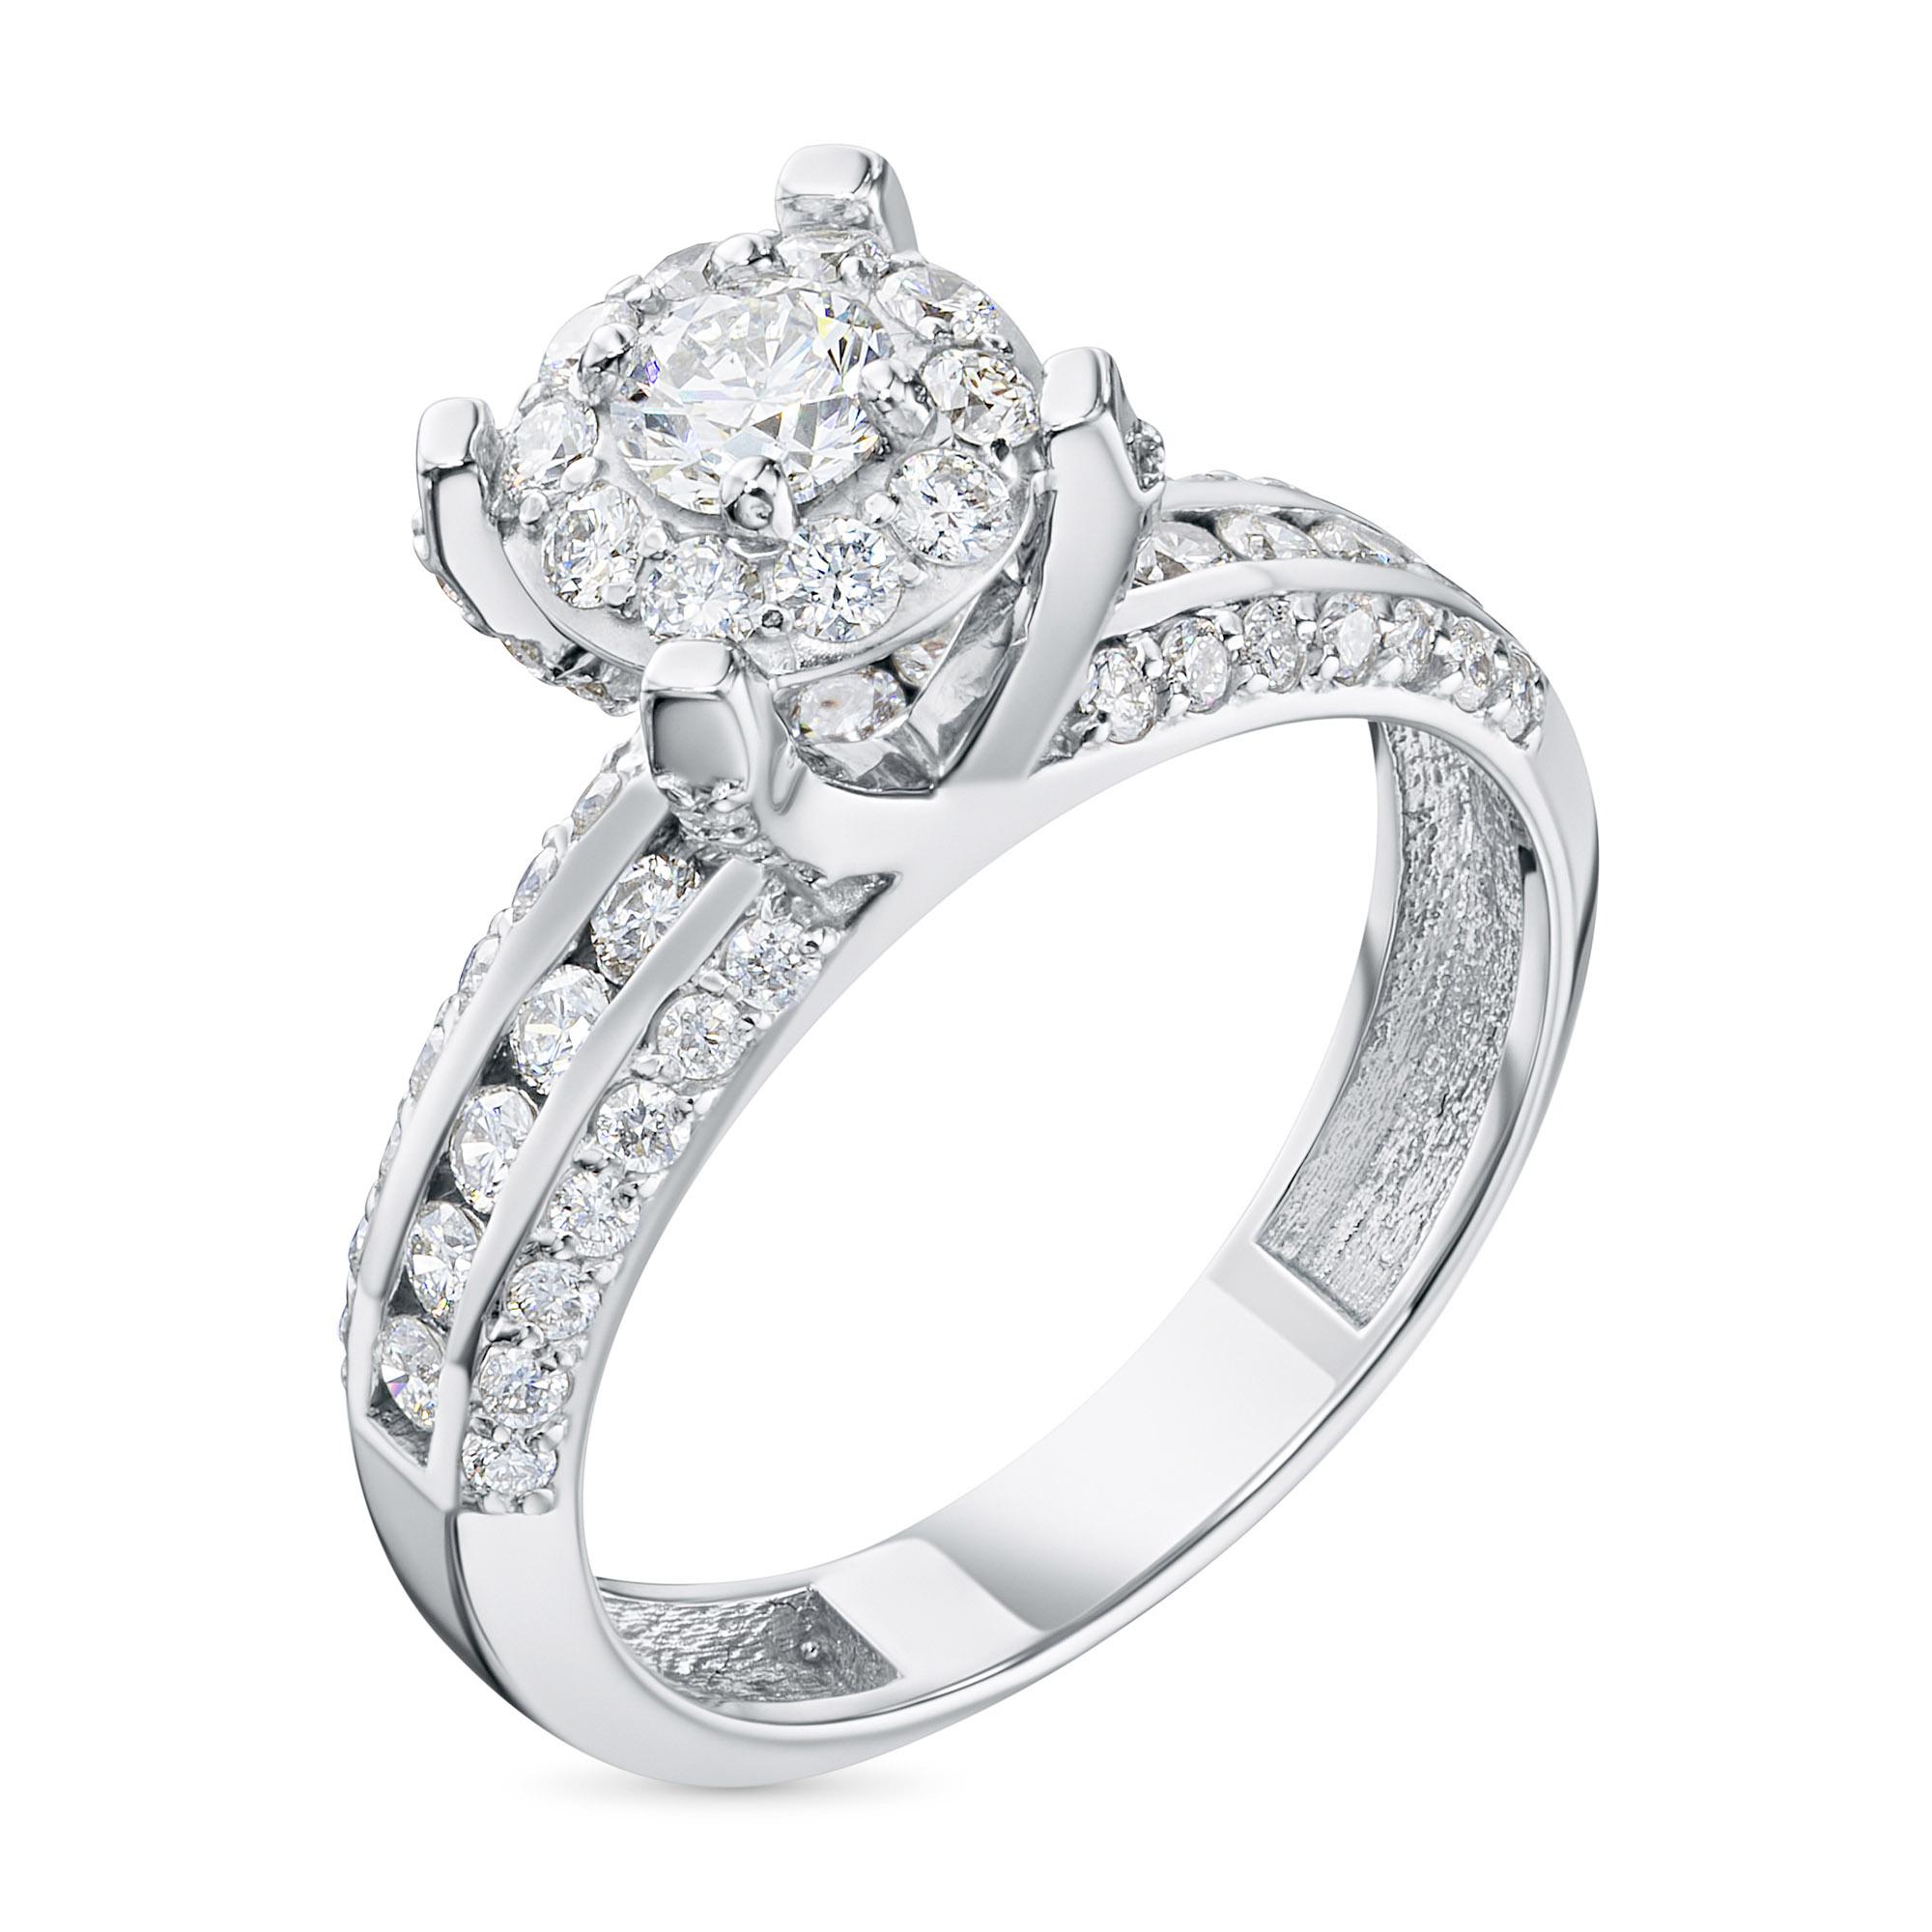 Кольцо из золота с бриллиантами э0901кц04210378